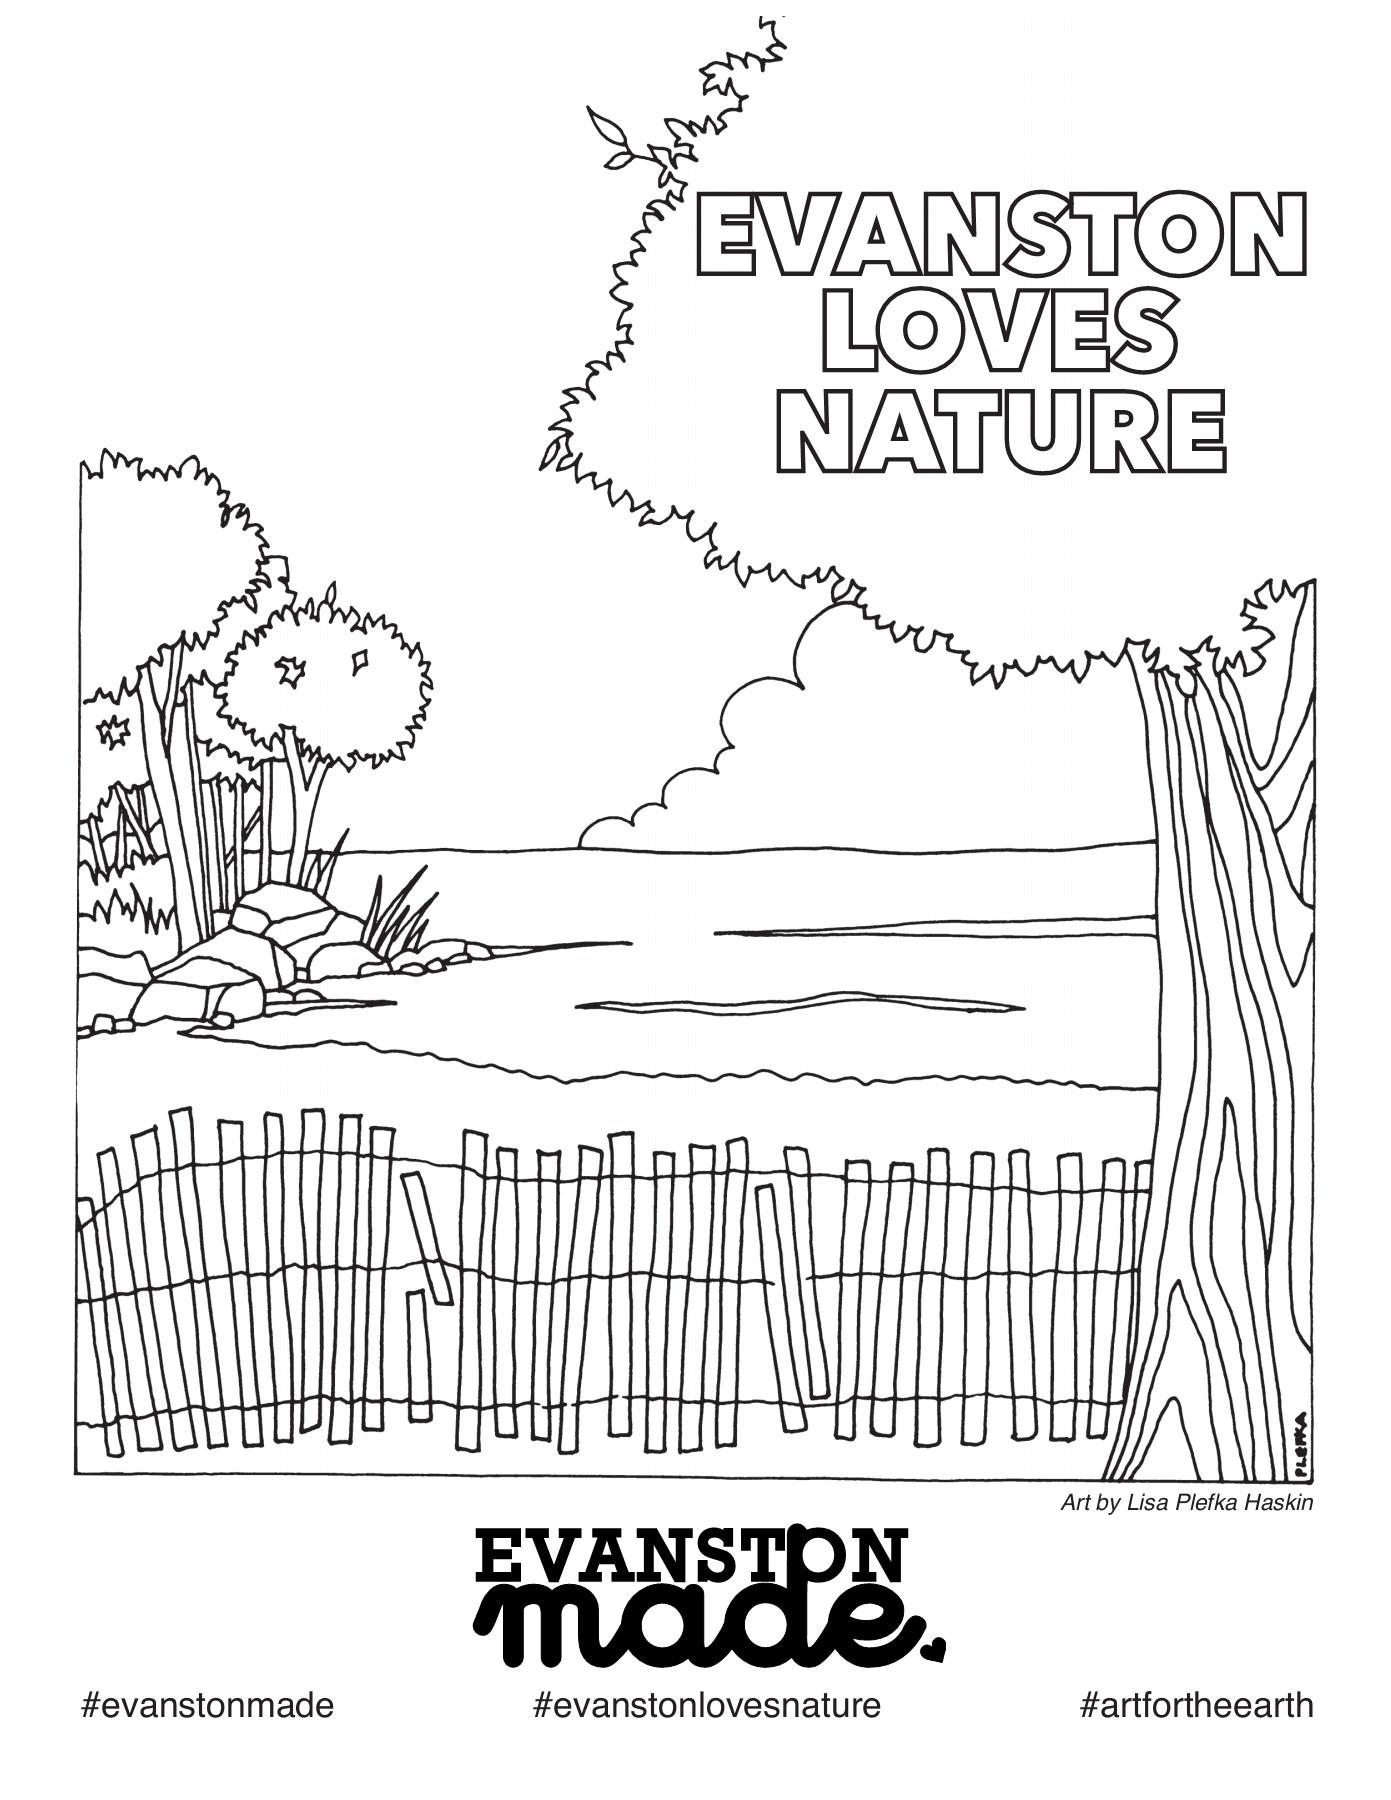 Evanston Loves Nature Coloring Book Kathy Flip Pdf Pubhtml5